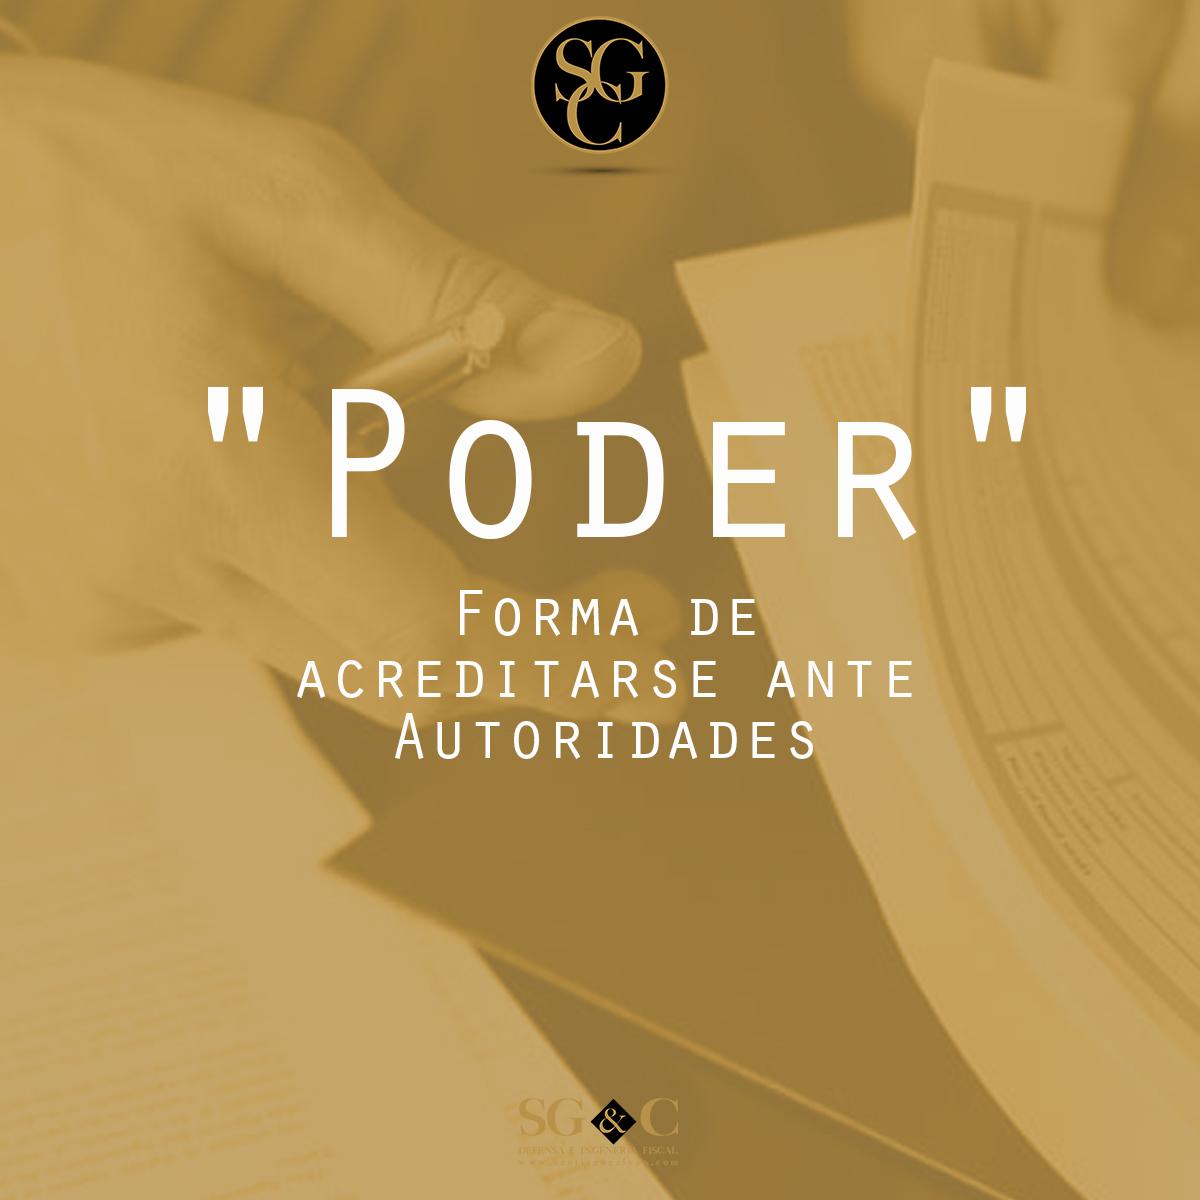 PODER:  FORMA DE ACREDITARSE ANTE AUTORIDADES FISCALES